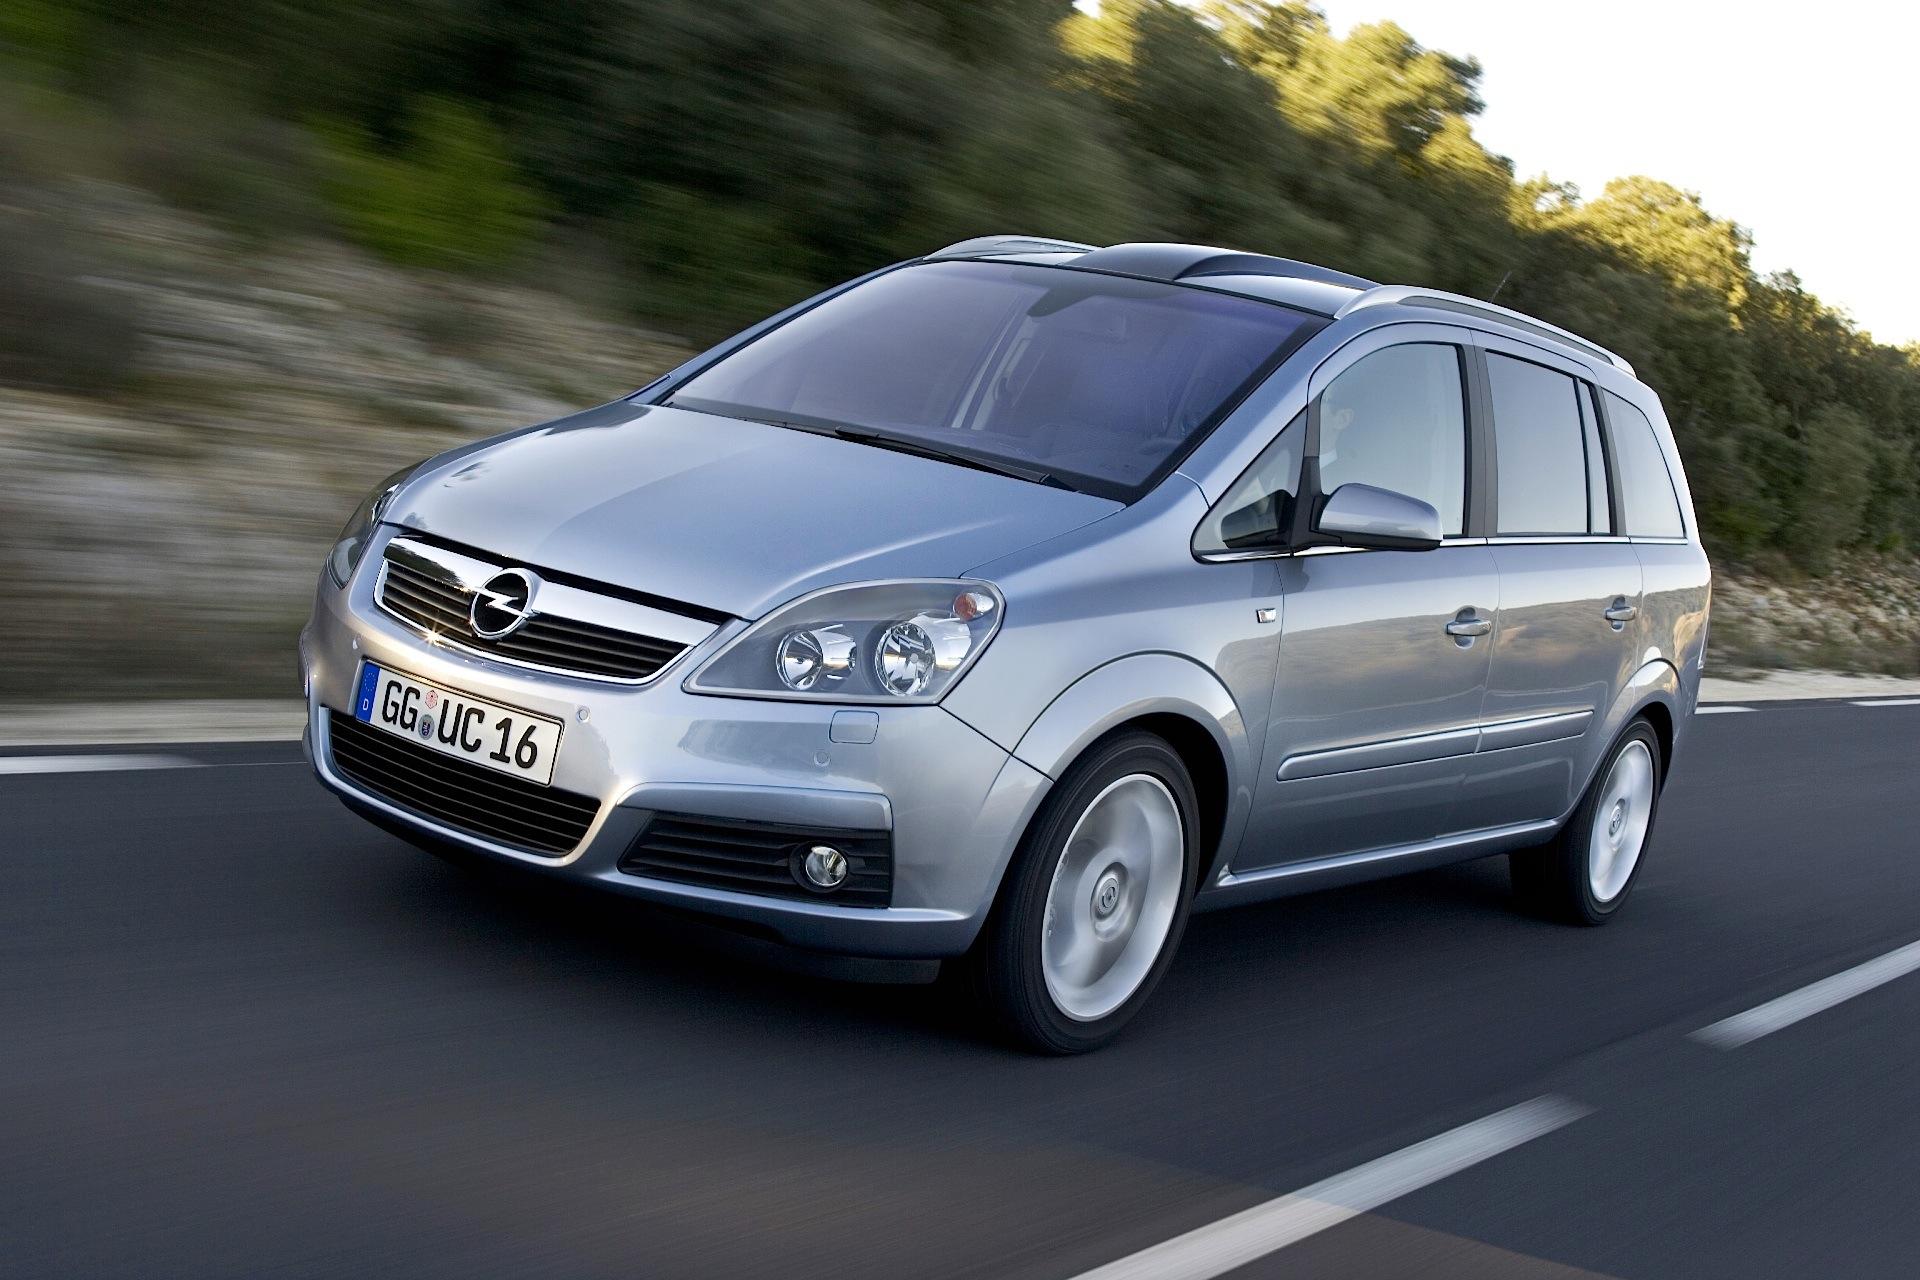 Opel Zafira 2011 Diesel >> OPEL Zafira specs & photos - 2008, 2009, 2010, 2011, 2012, 2013, 2014 - autoevolution